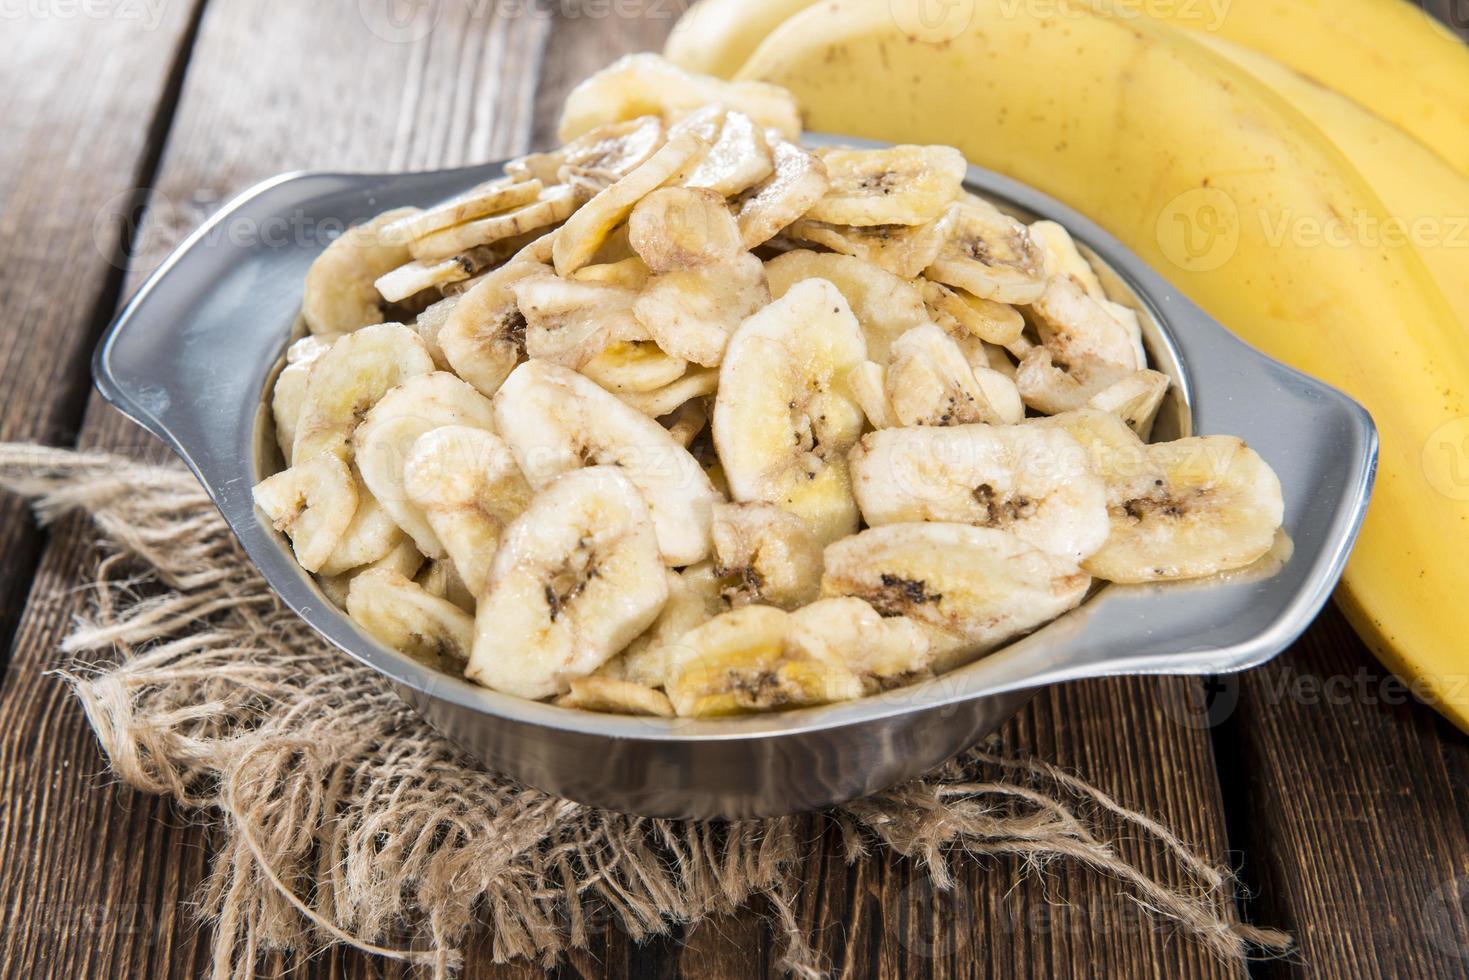 Bowl with Banana Chips photo